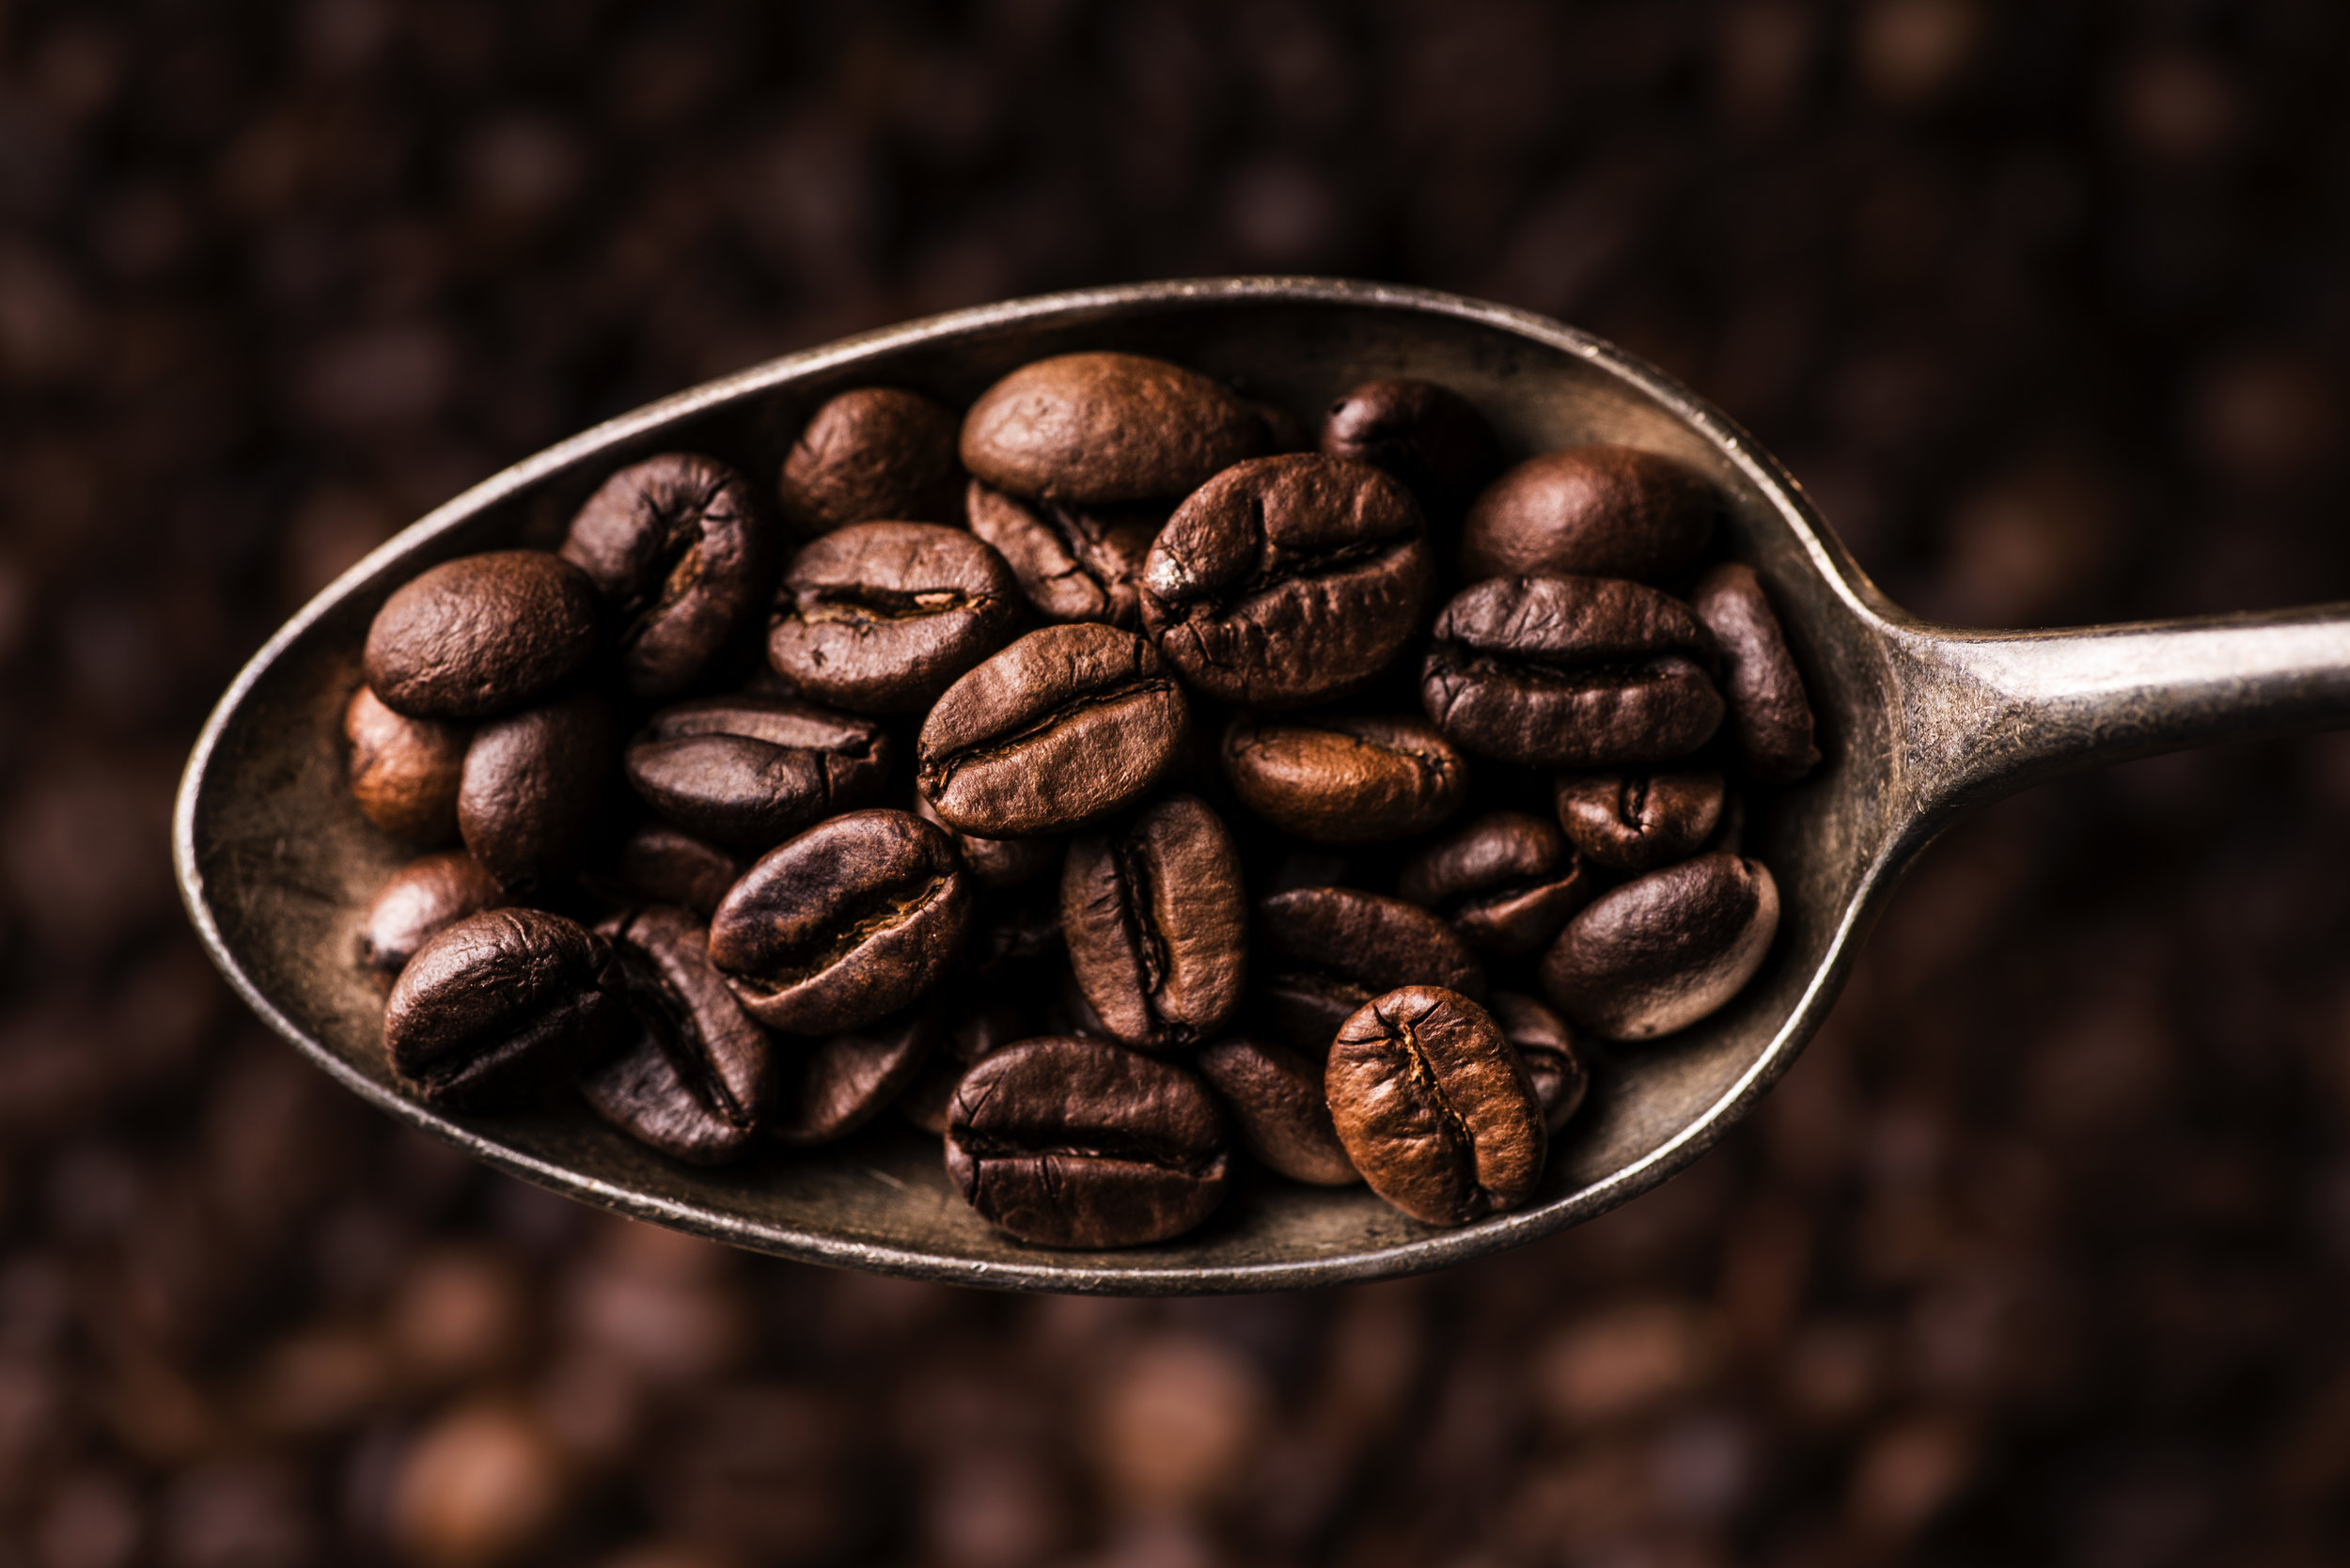 Top-dog-coffee-bar-coffee-beans-on-spoon.jpg